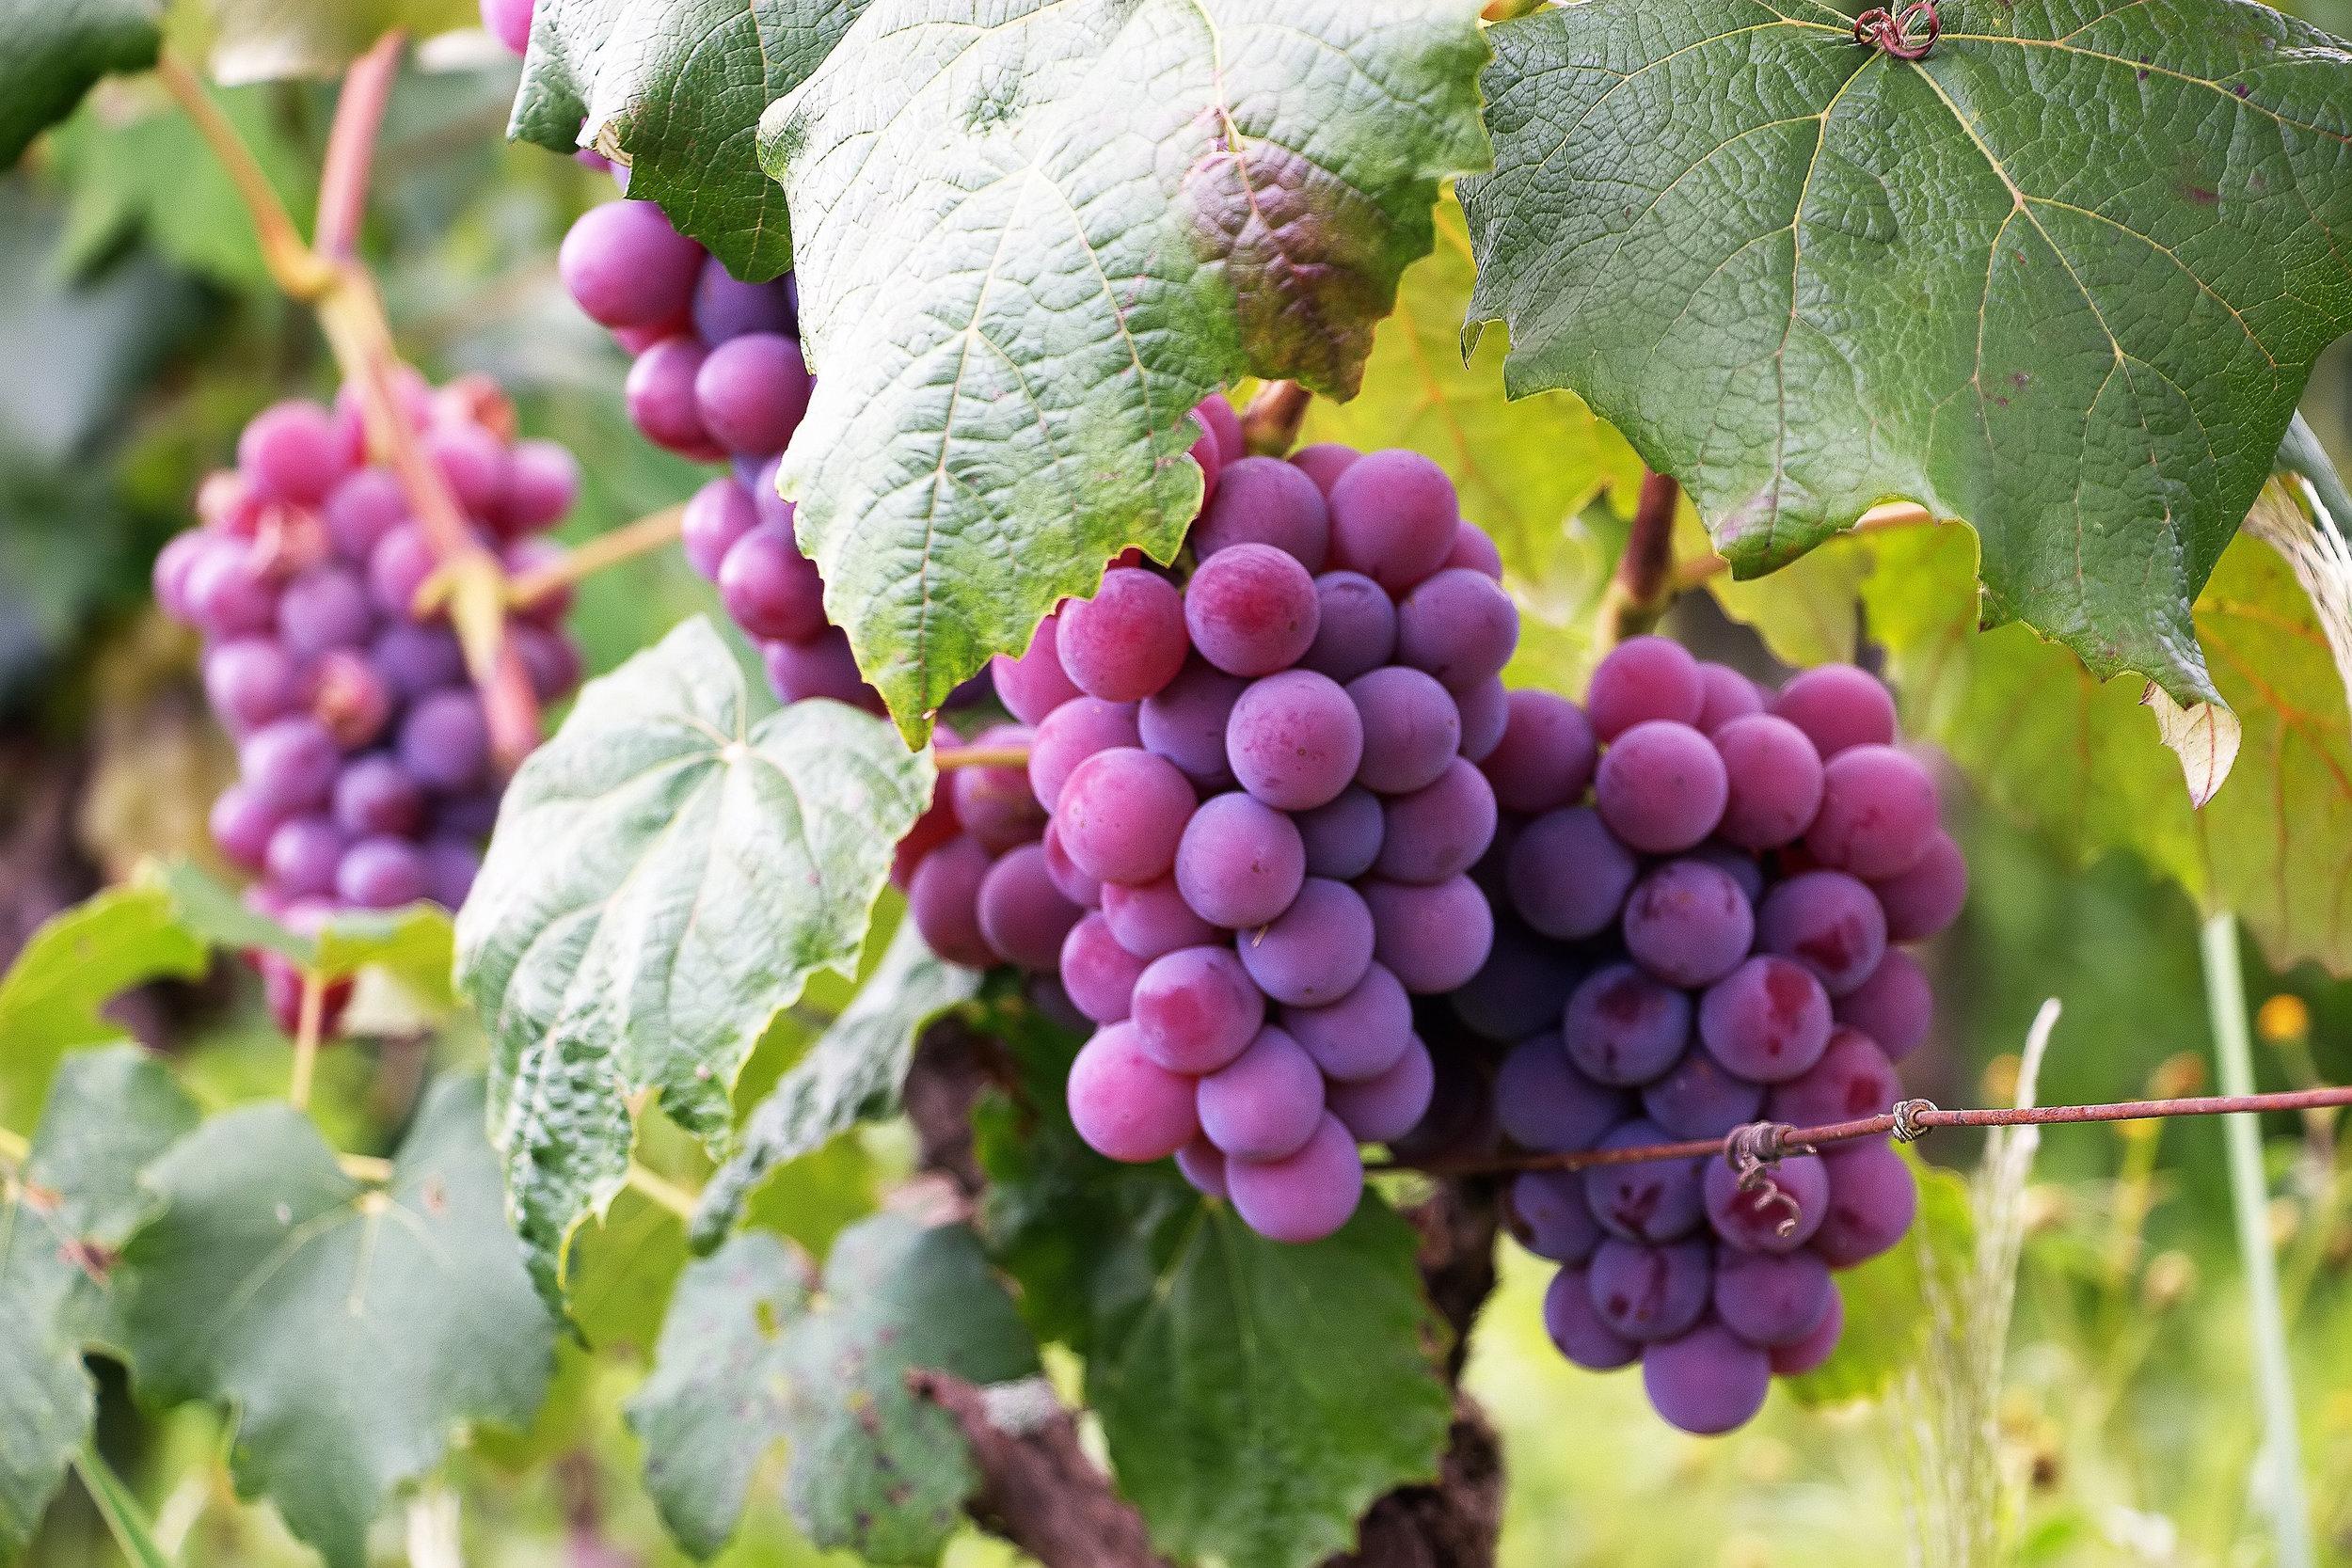 berries-bunch-colors-760281.jpg